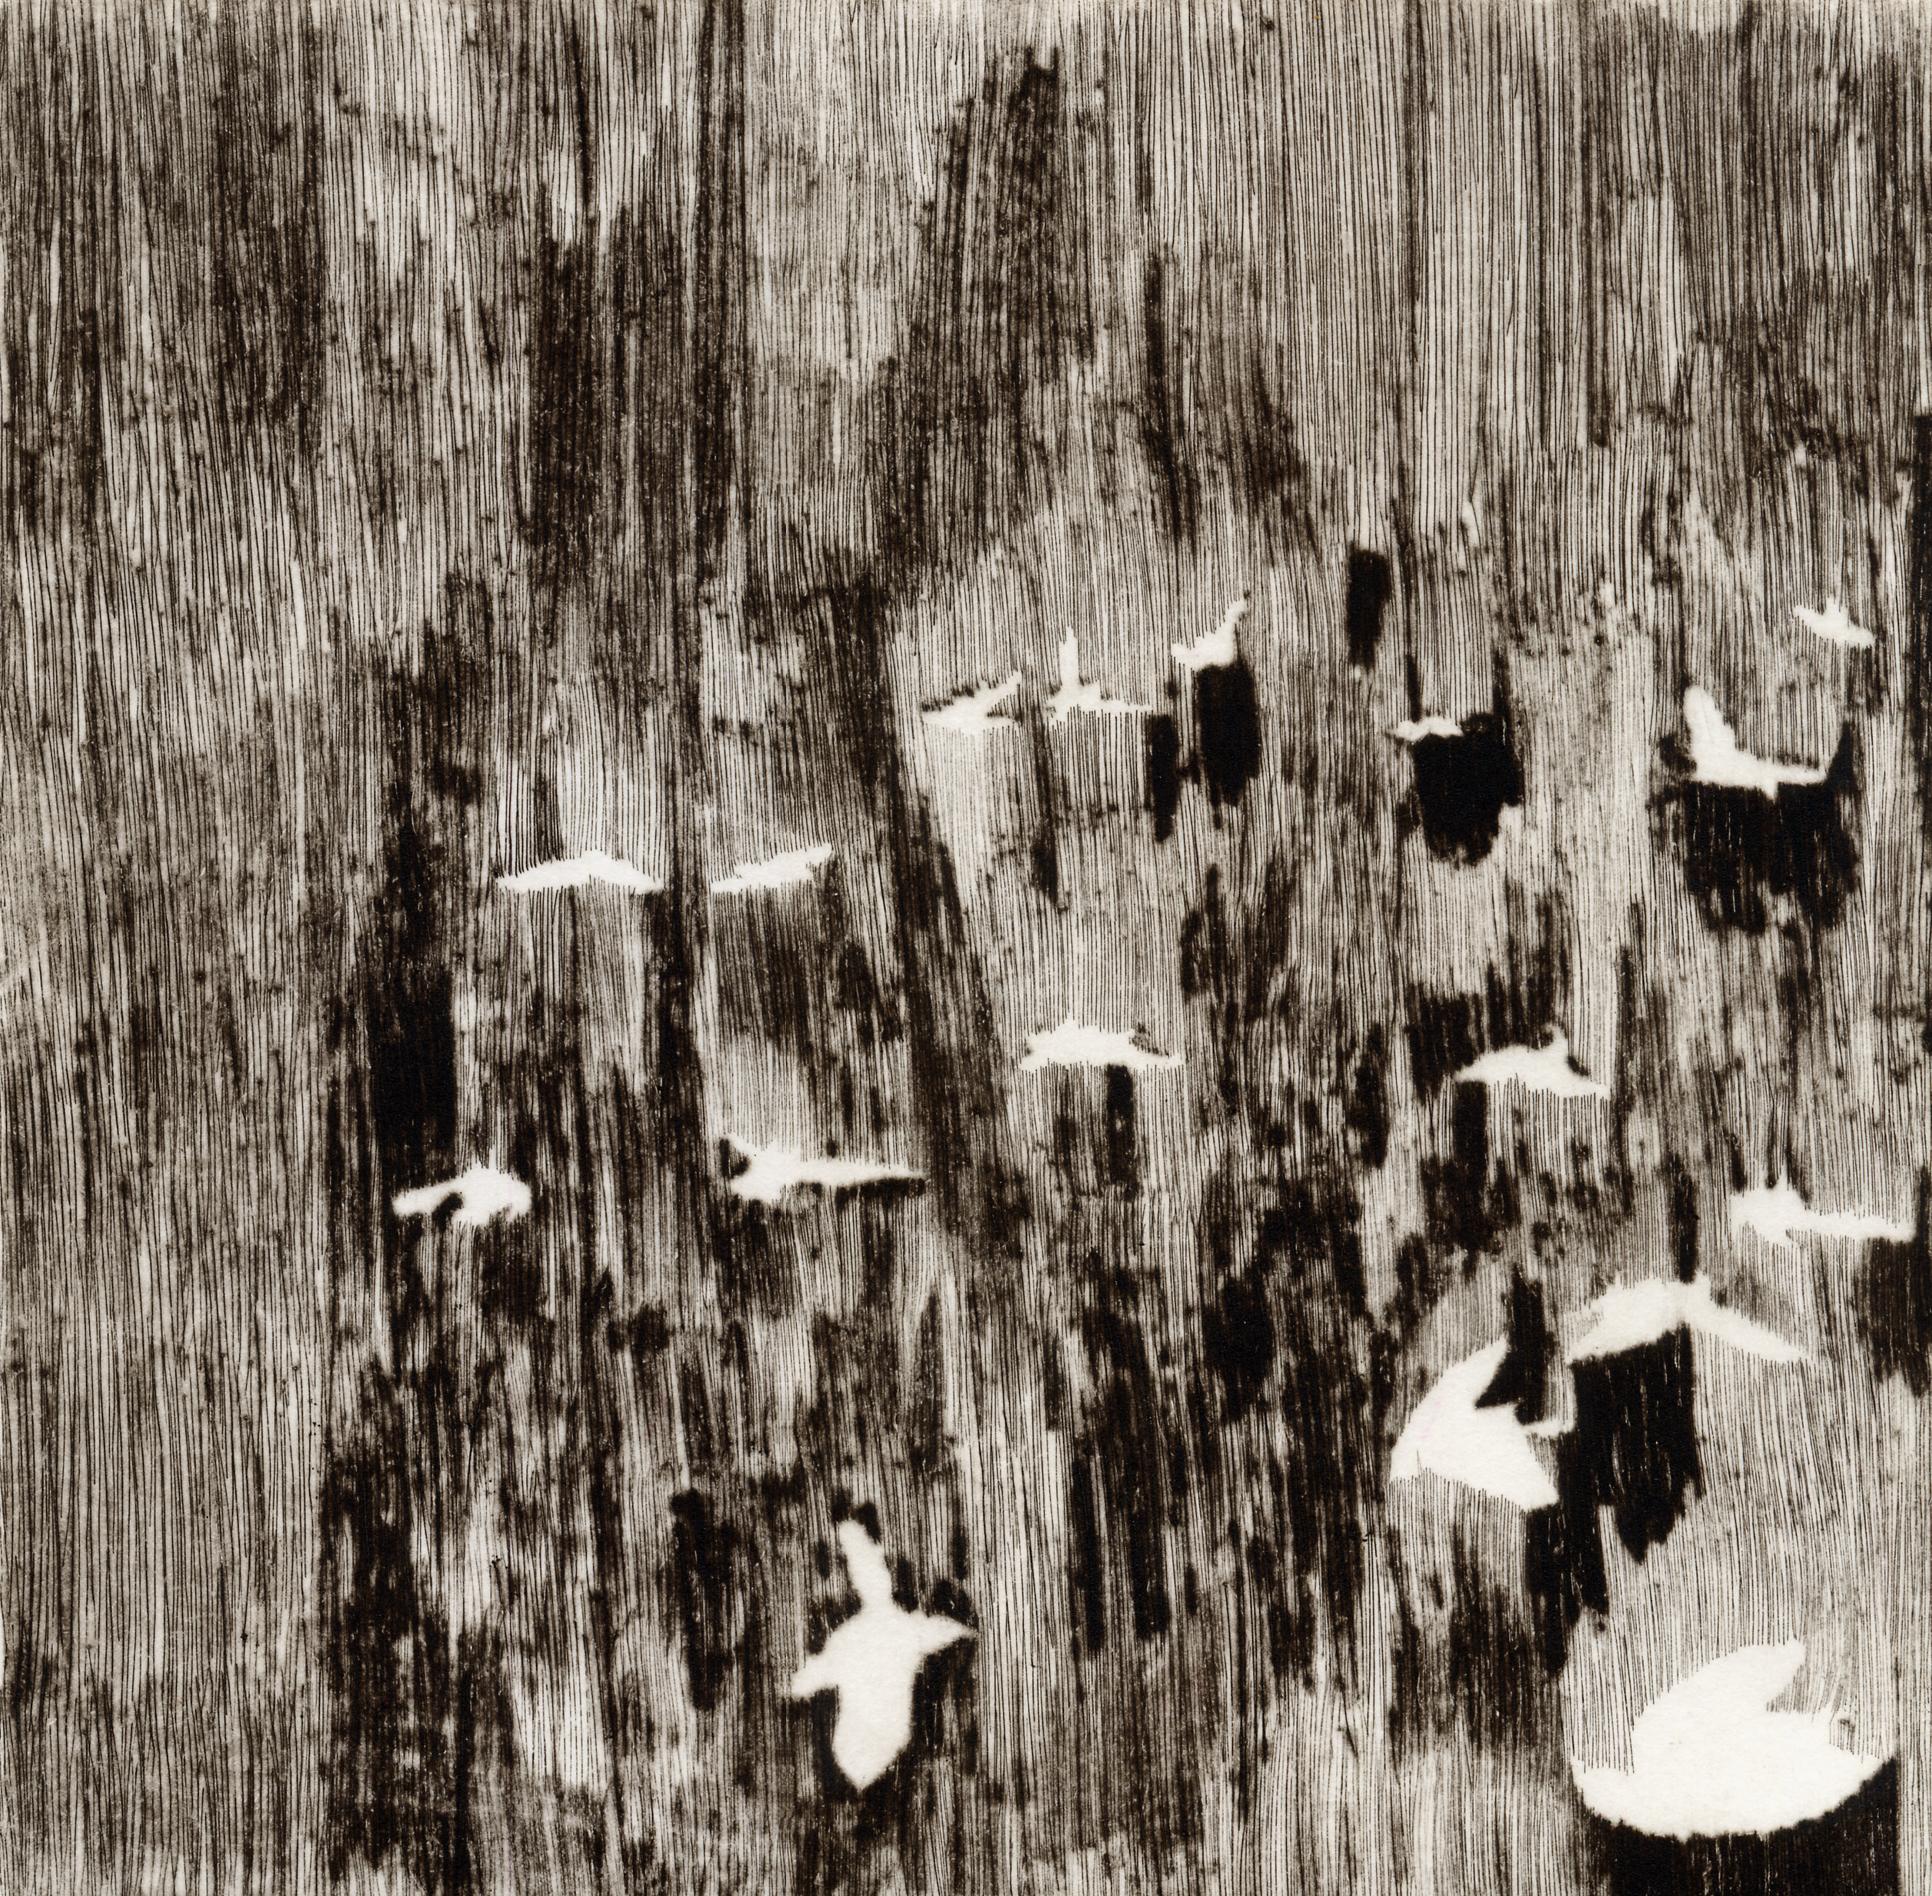 <i>les oiseaux</i>, 2008, pointe sèche, 24x25cm